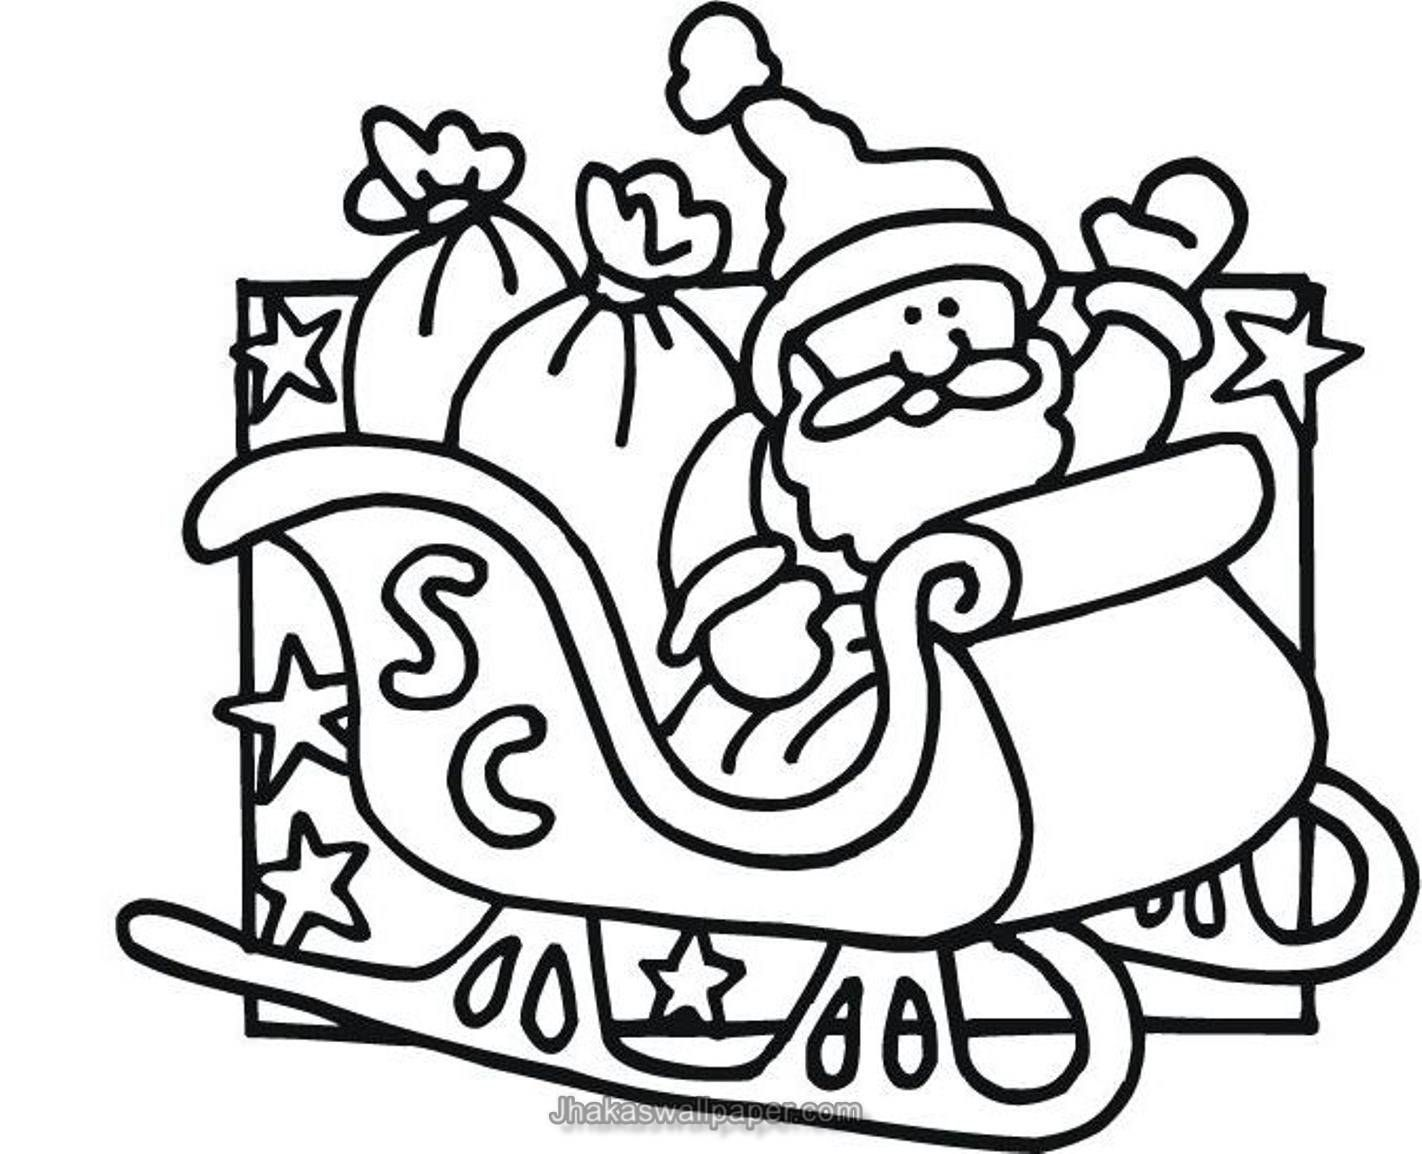 Coloring Pages Santa Claus